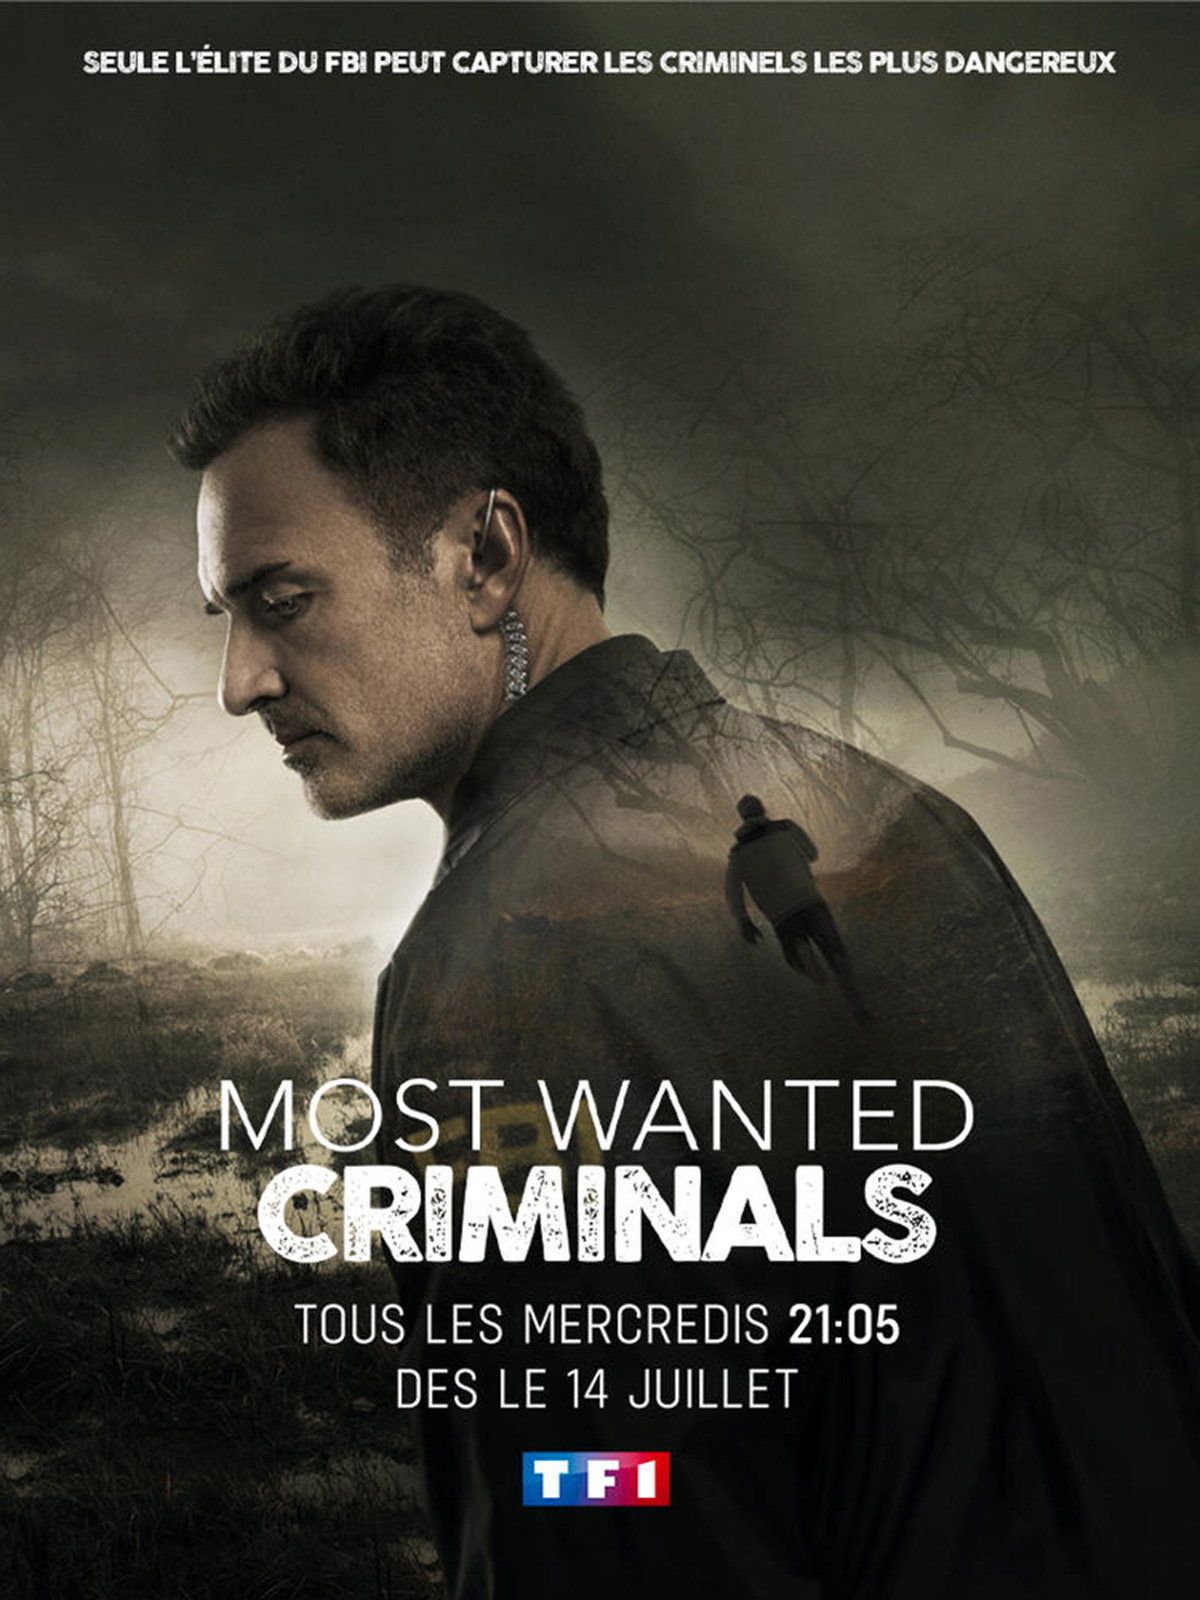 38 - Most Wanted Criminals